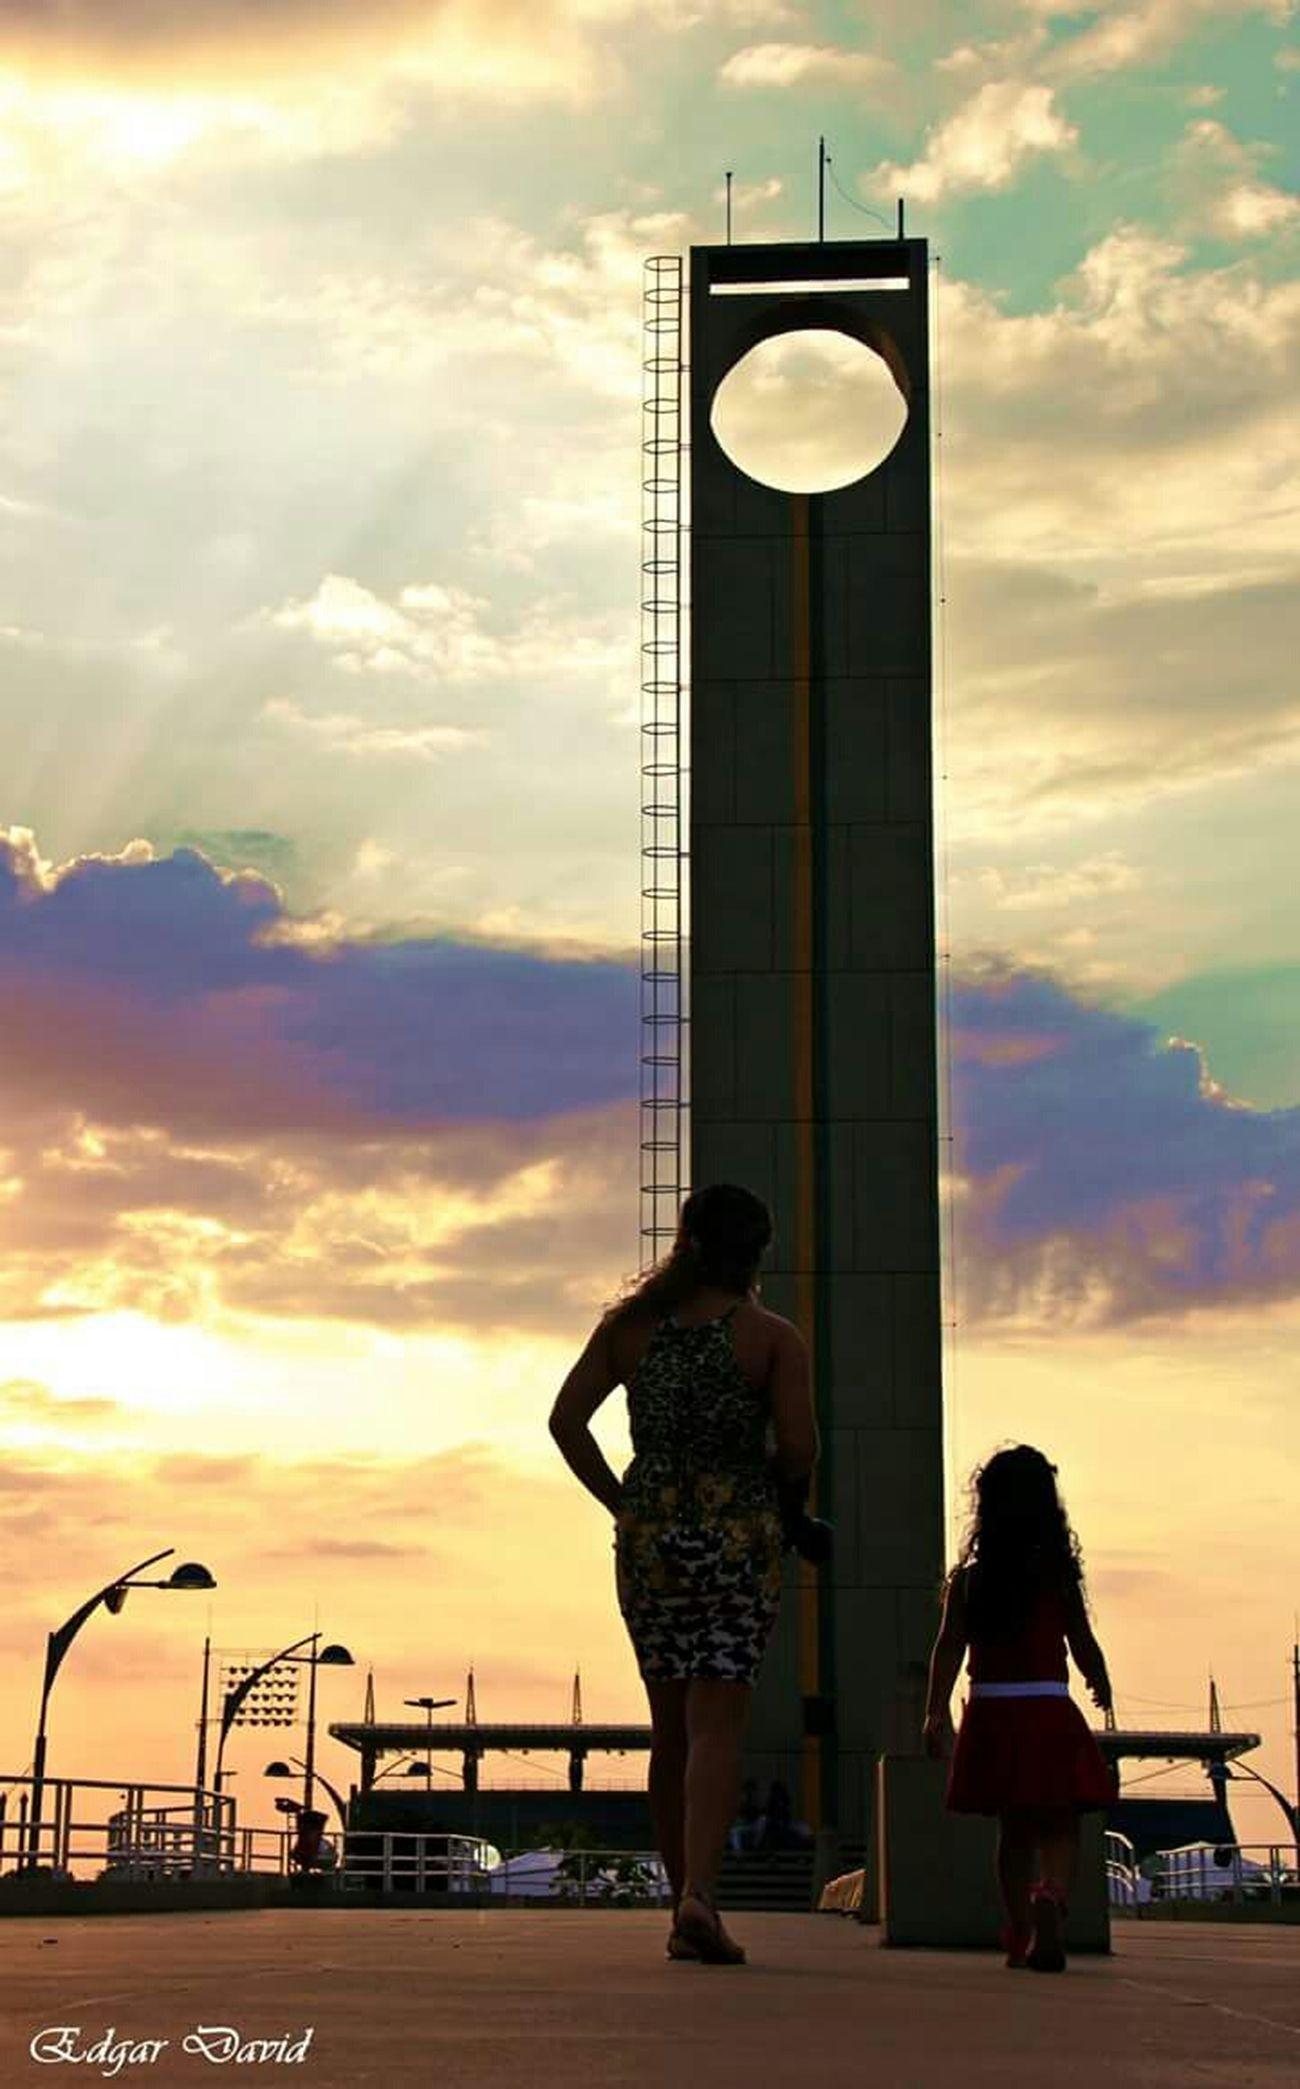 Marcozerodoequador Macapá Amapá Brasil Sunset Amor Vida Photography Register Deuslevolt